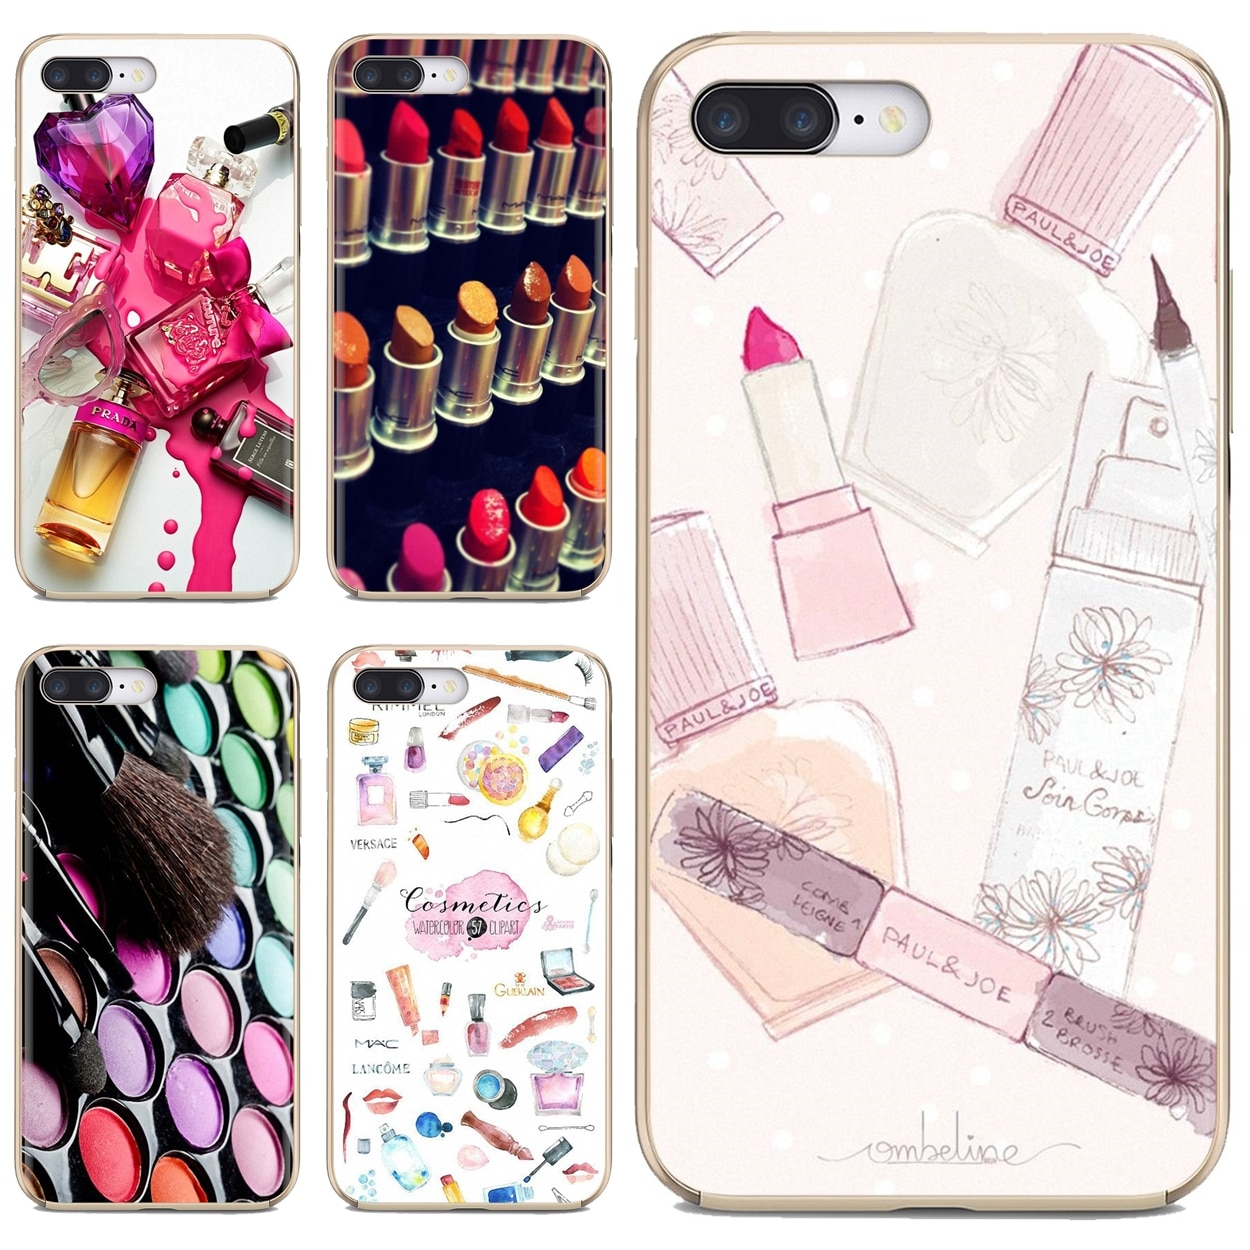 Funda suave de teléfono para Huawei Mate Honor 4C 5C 5X 6X 7 7A 7C 8 9 10 8C 8X 20 Lite Pro herramientas pintalabios Beauty Girl Makeup Set